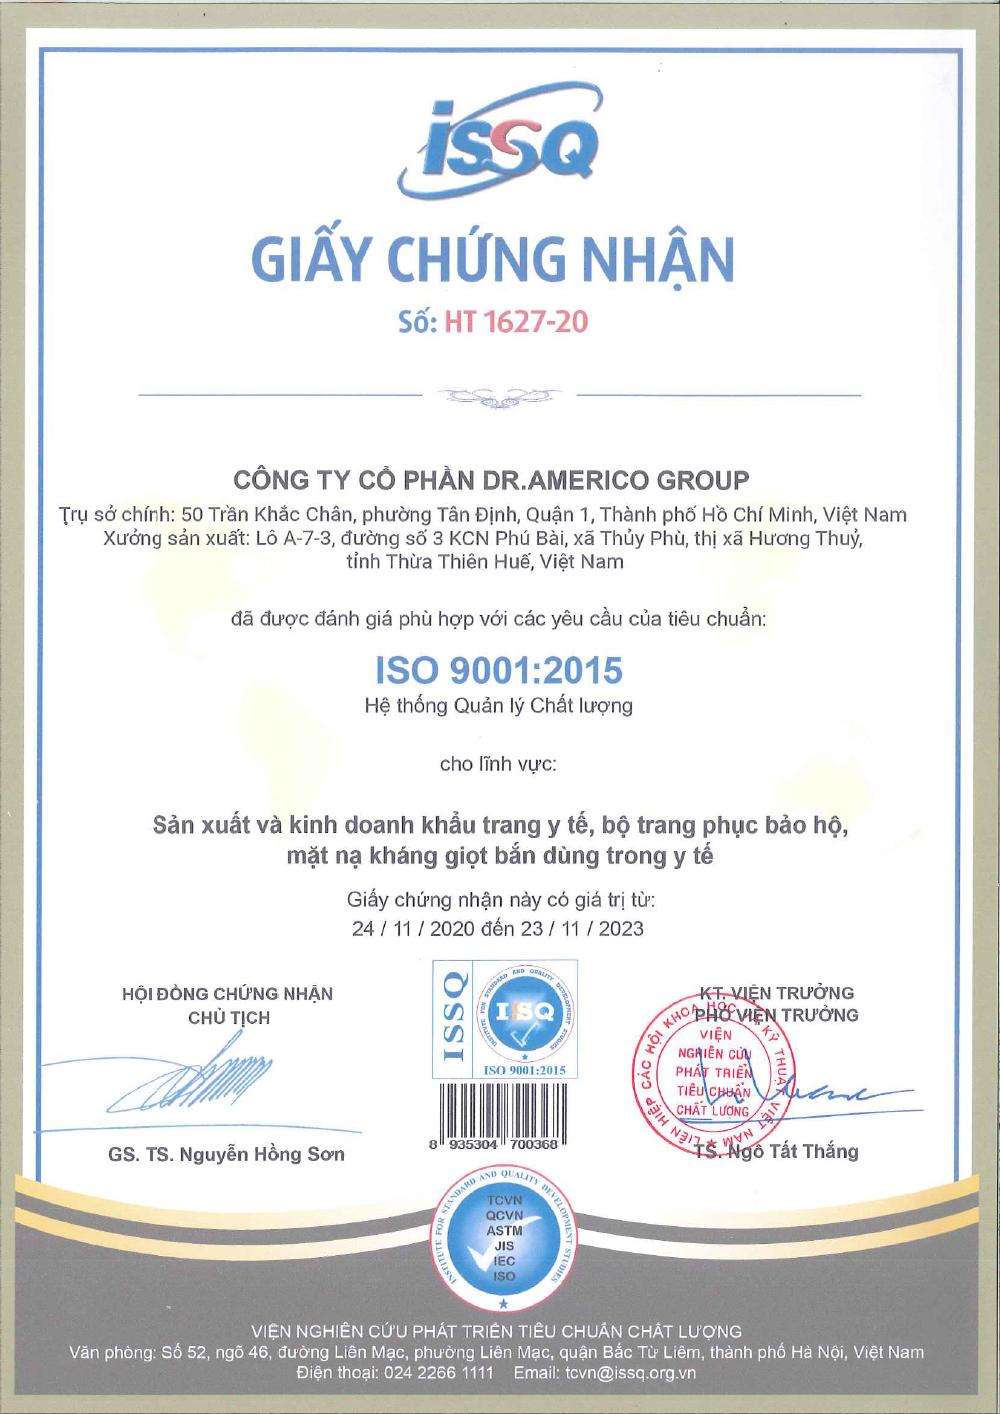 2. ISO 9001 DR. AMERICO THUA THIEN HUE PROVINCE 1